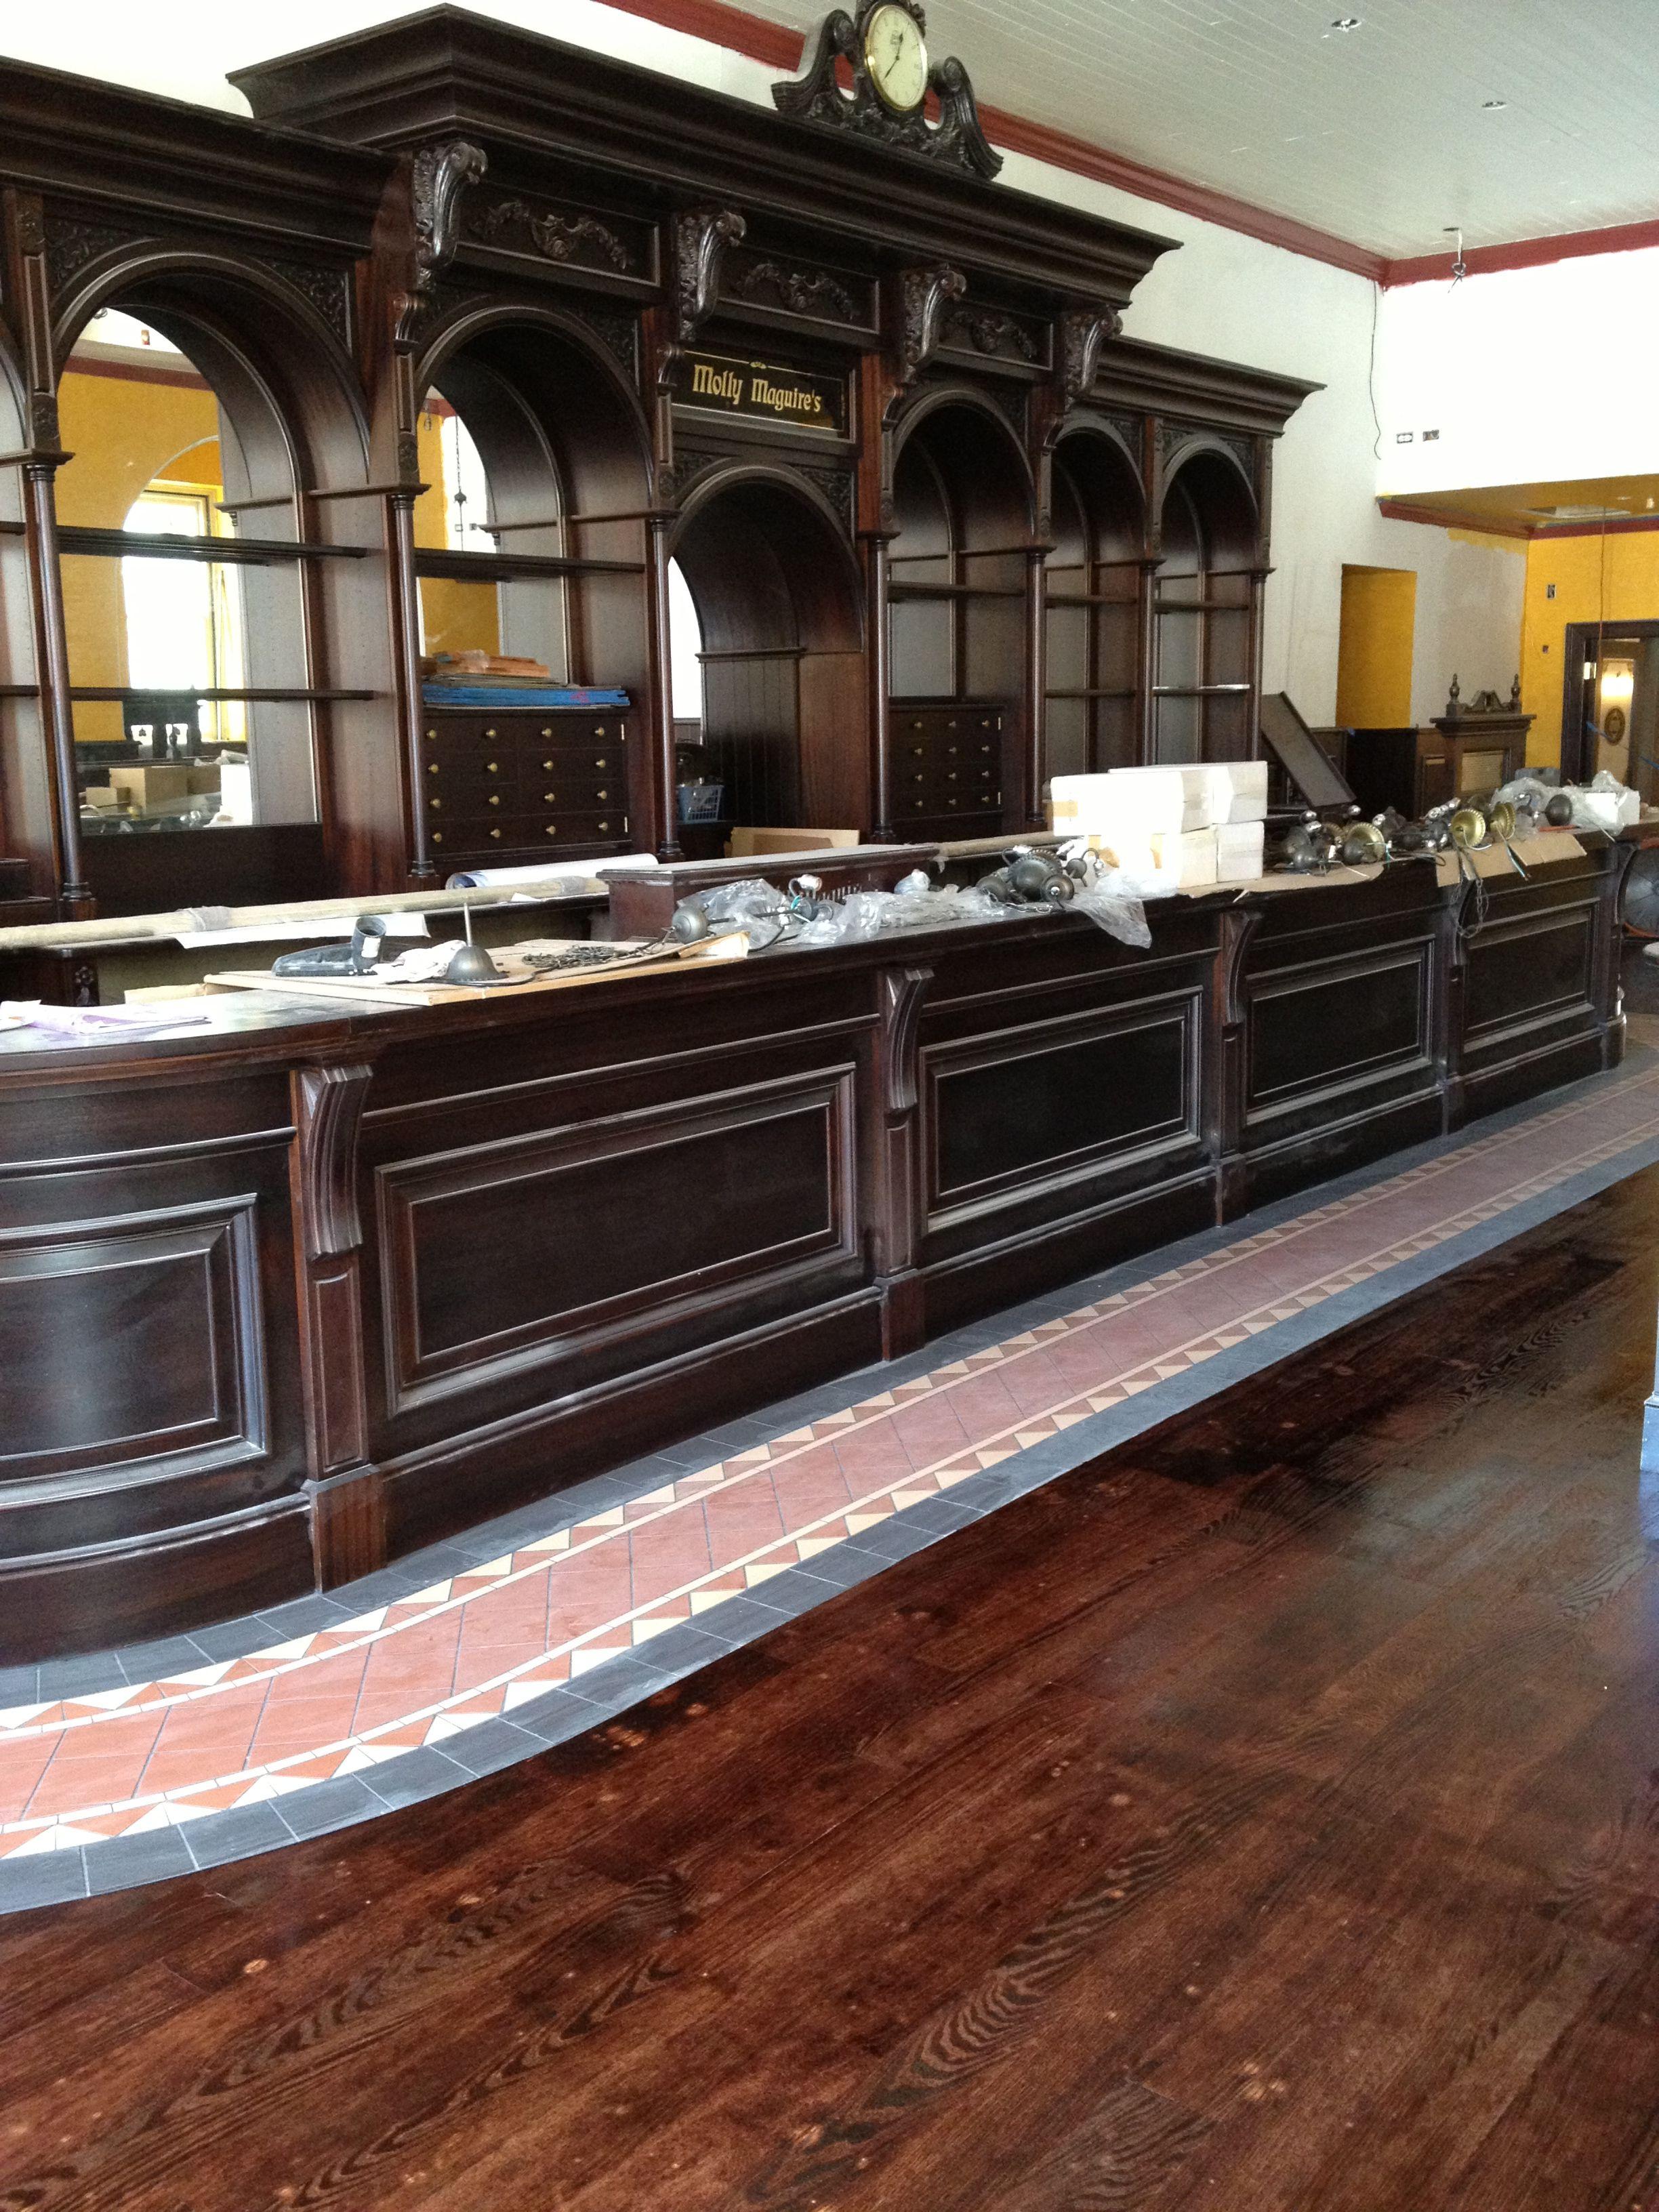 irish victorian bar almost complete keanes irish bars. Black Bedroom Furniture Sets. Home Design Ideas